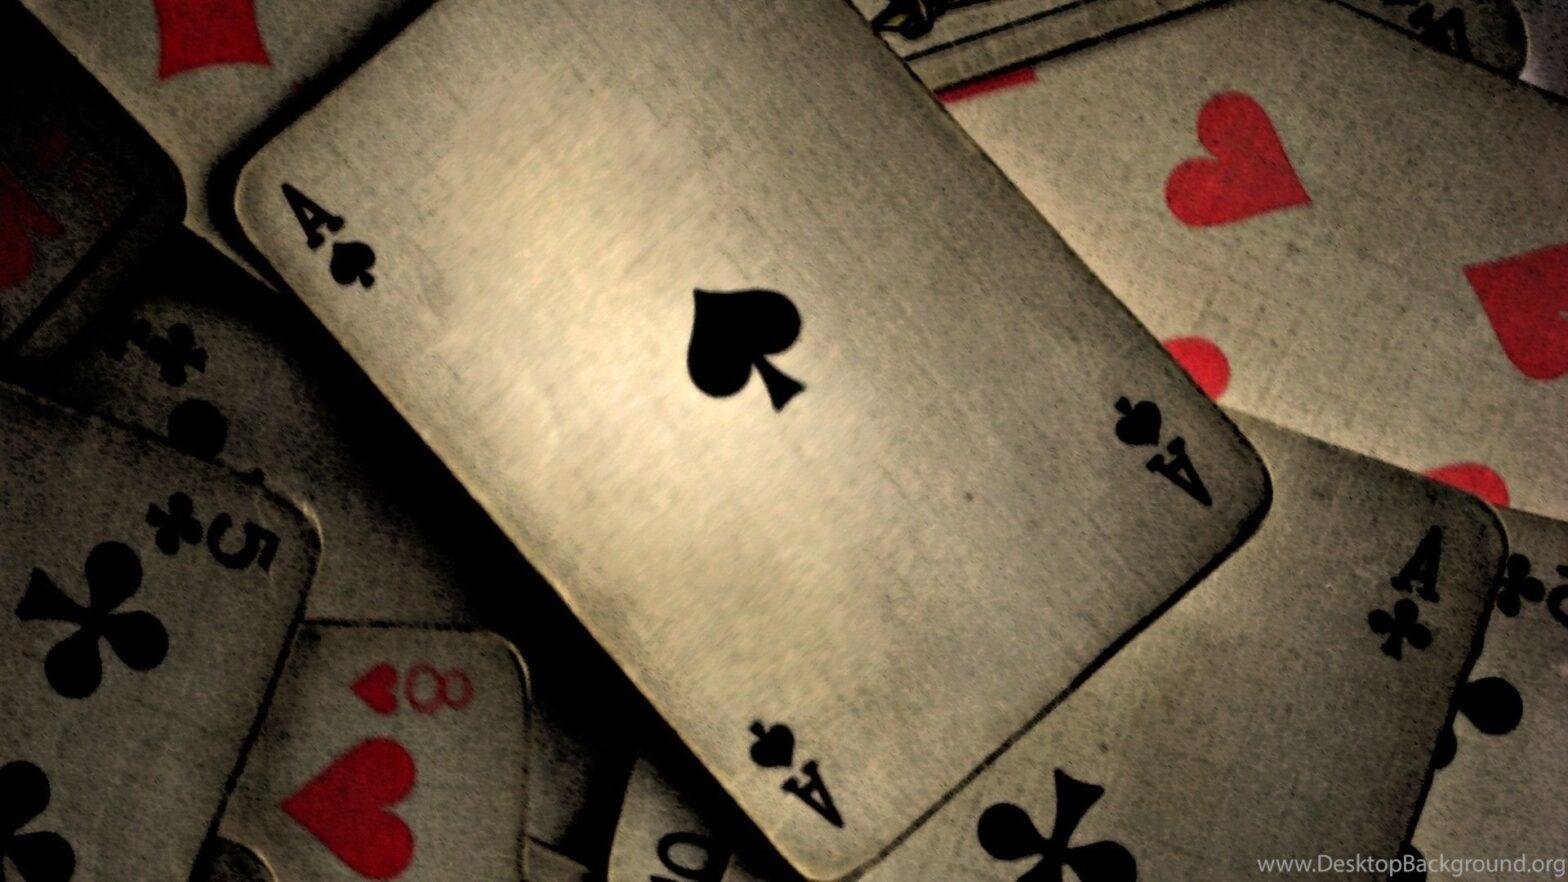 Michigan Online Gambling Establishments